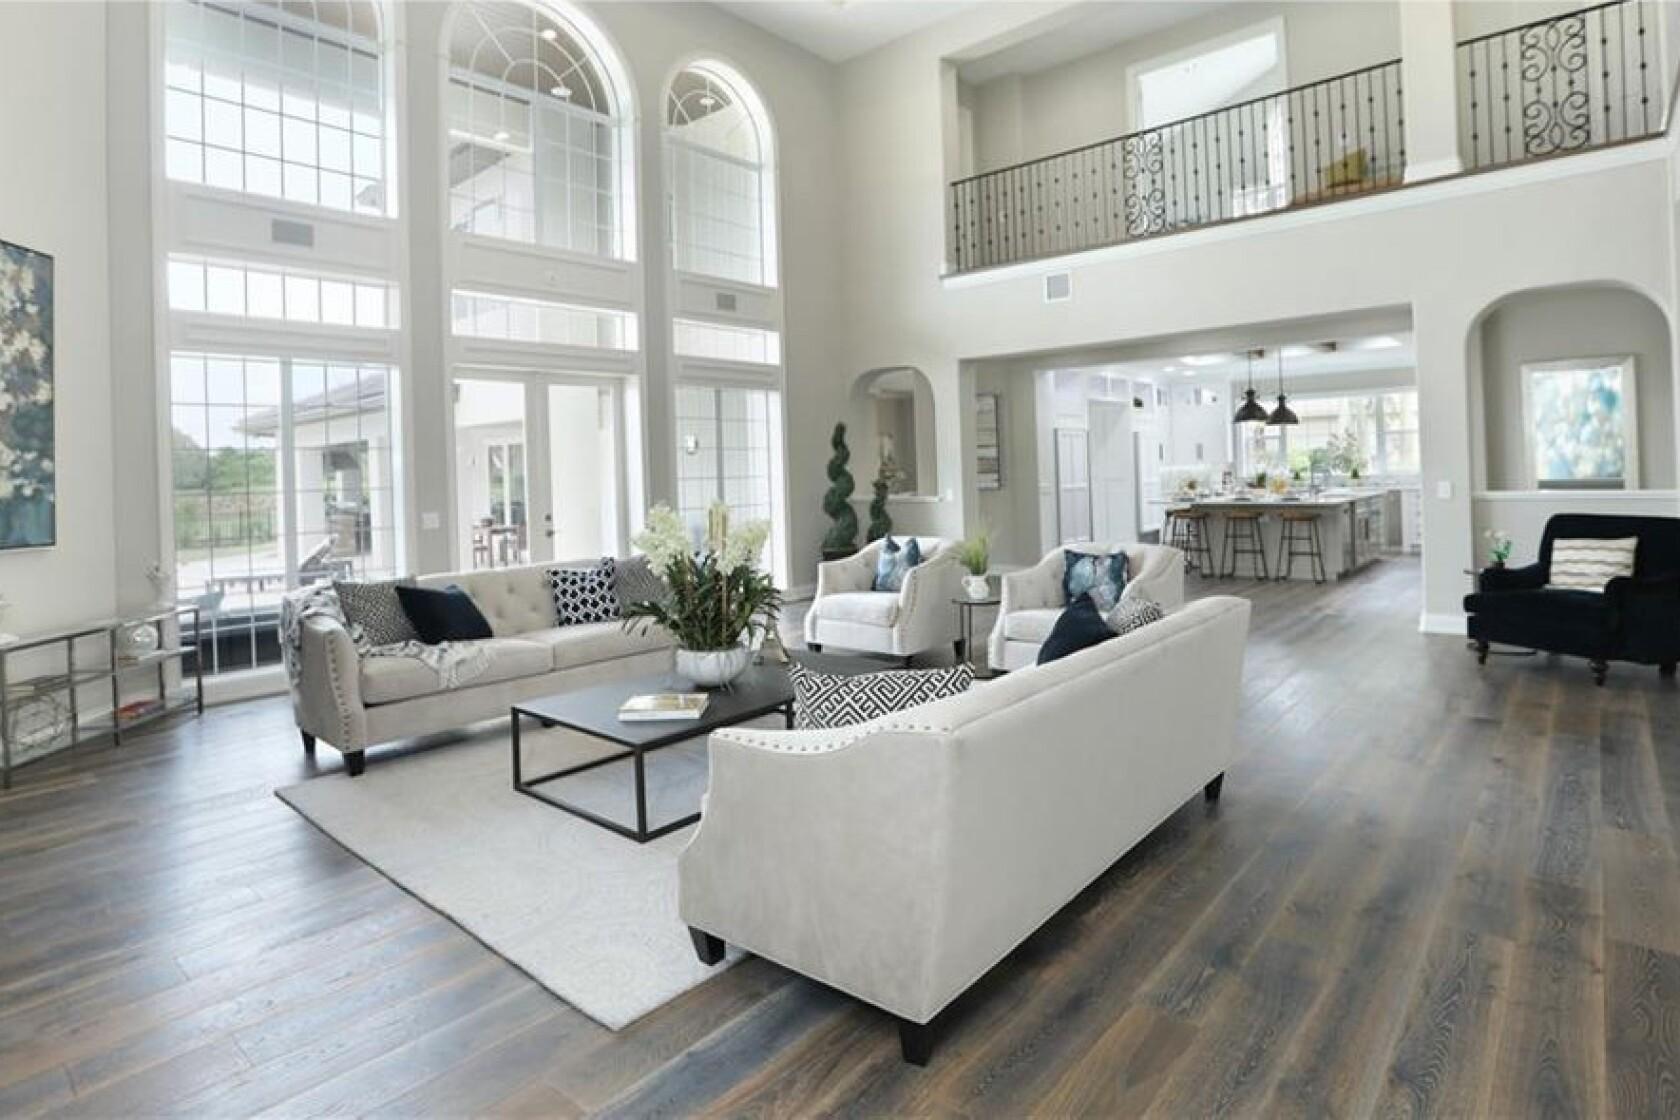 Florida mansion revamped by Boyz II Men's Nathan Morris